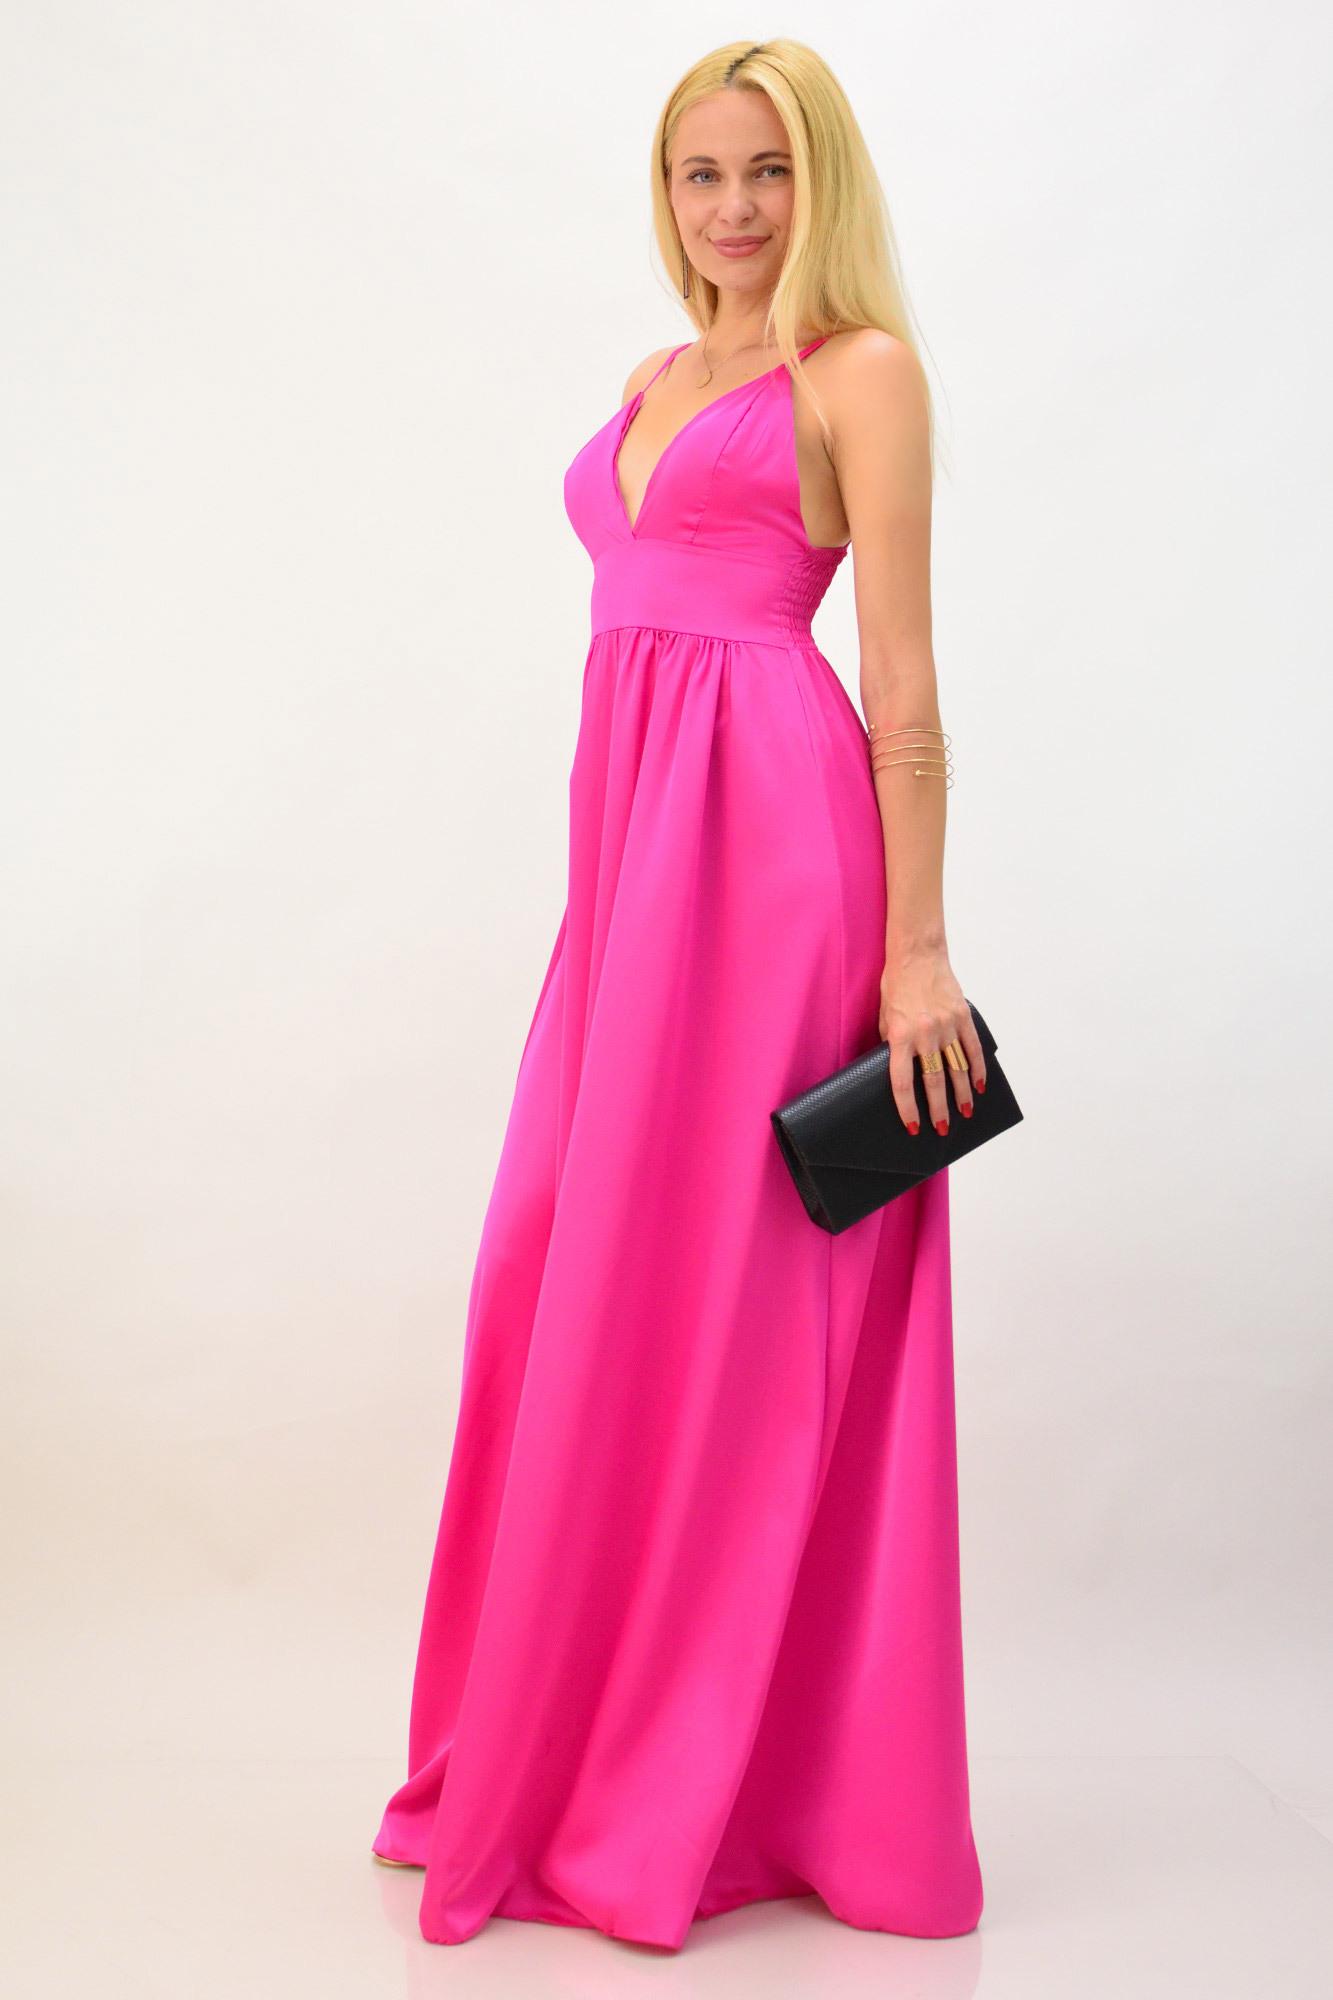 e580a828510 Μακρύ φόρεμα σατέν | Βραδινά Φορέματα | POTRE